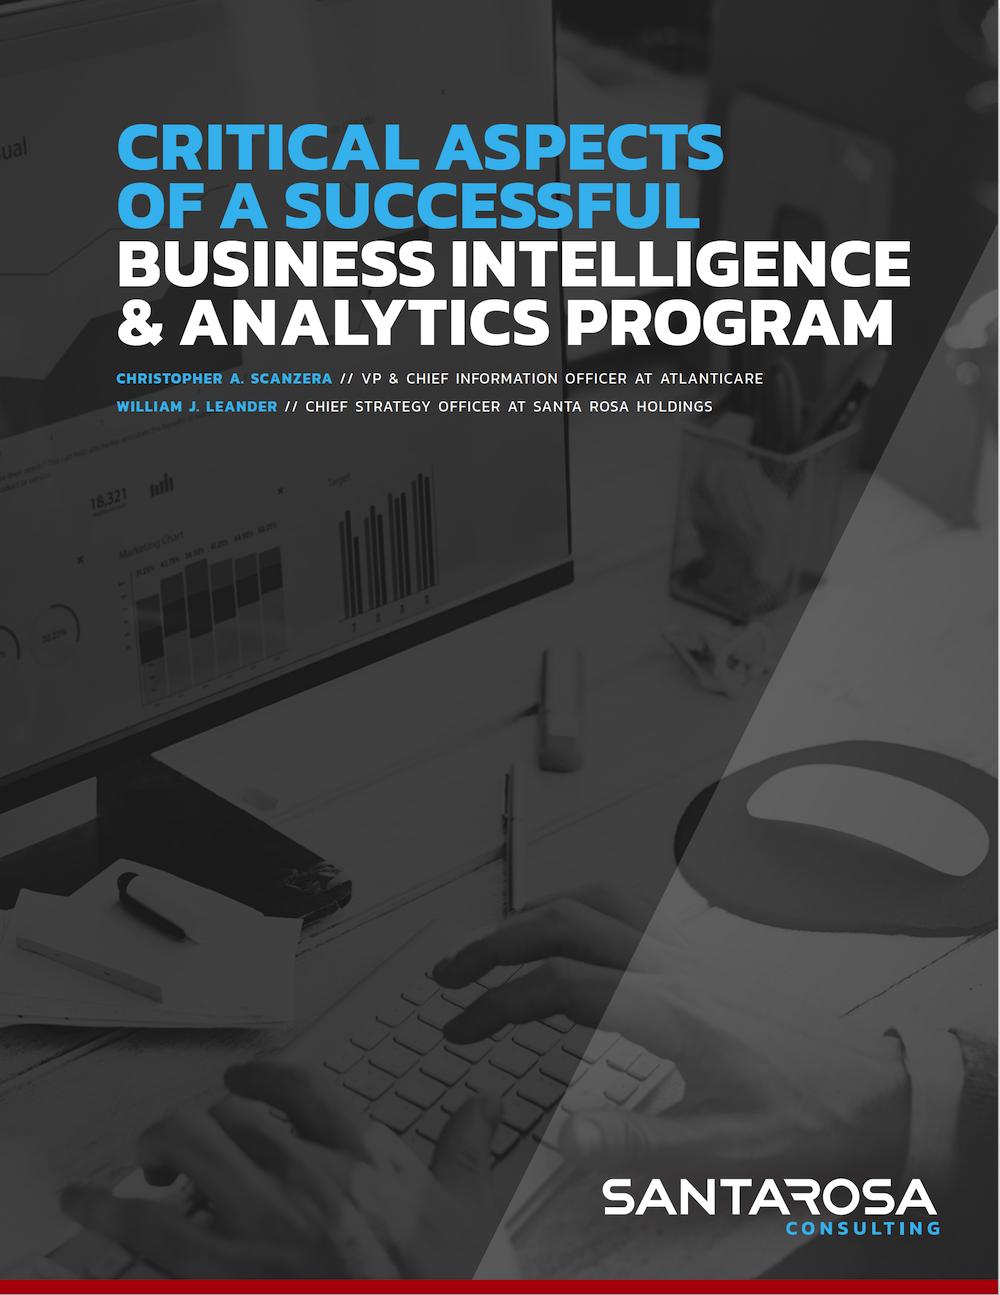 BI&A Program Resource